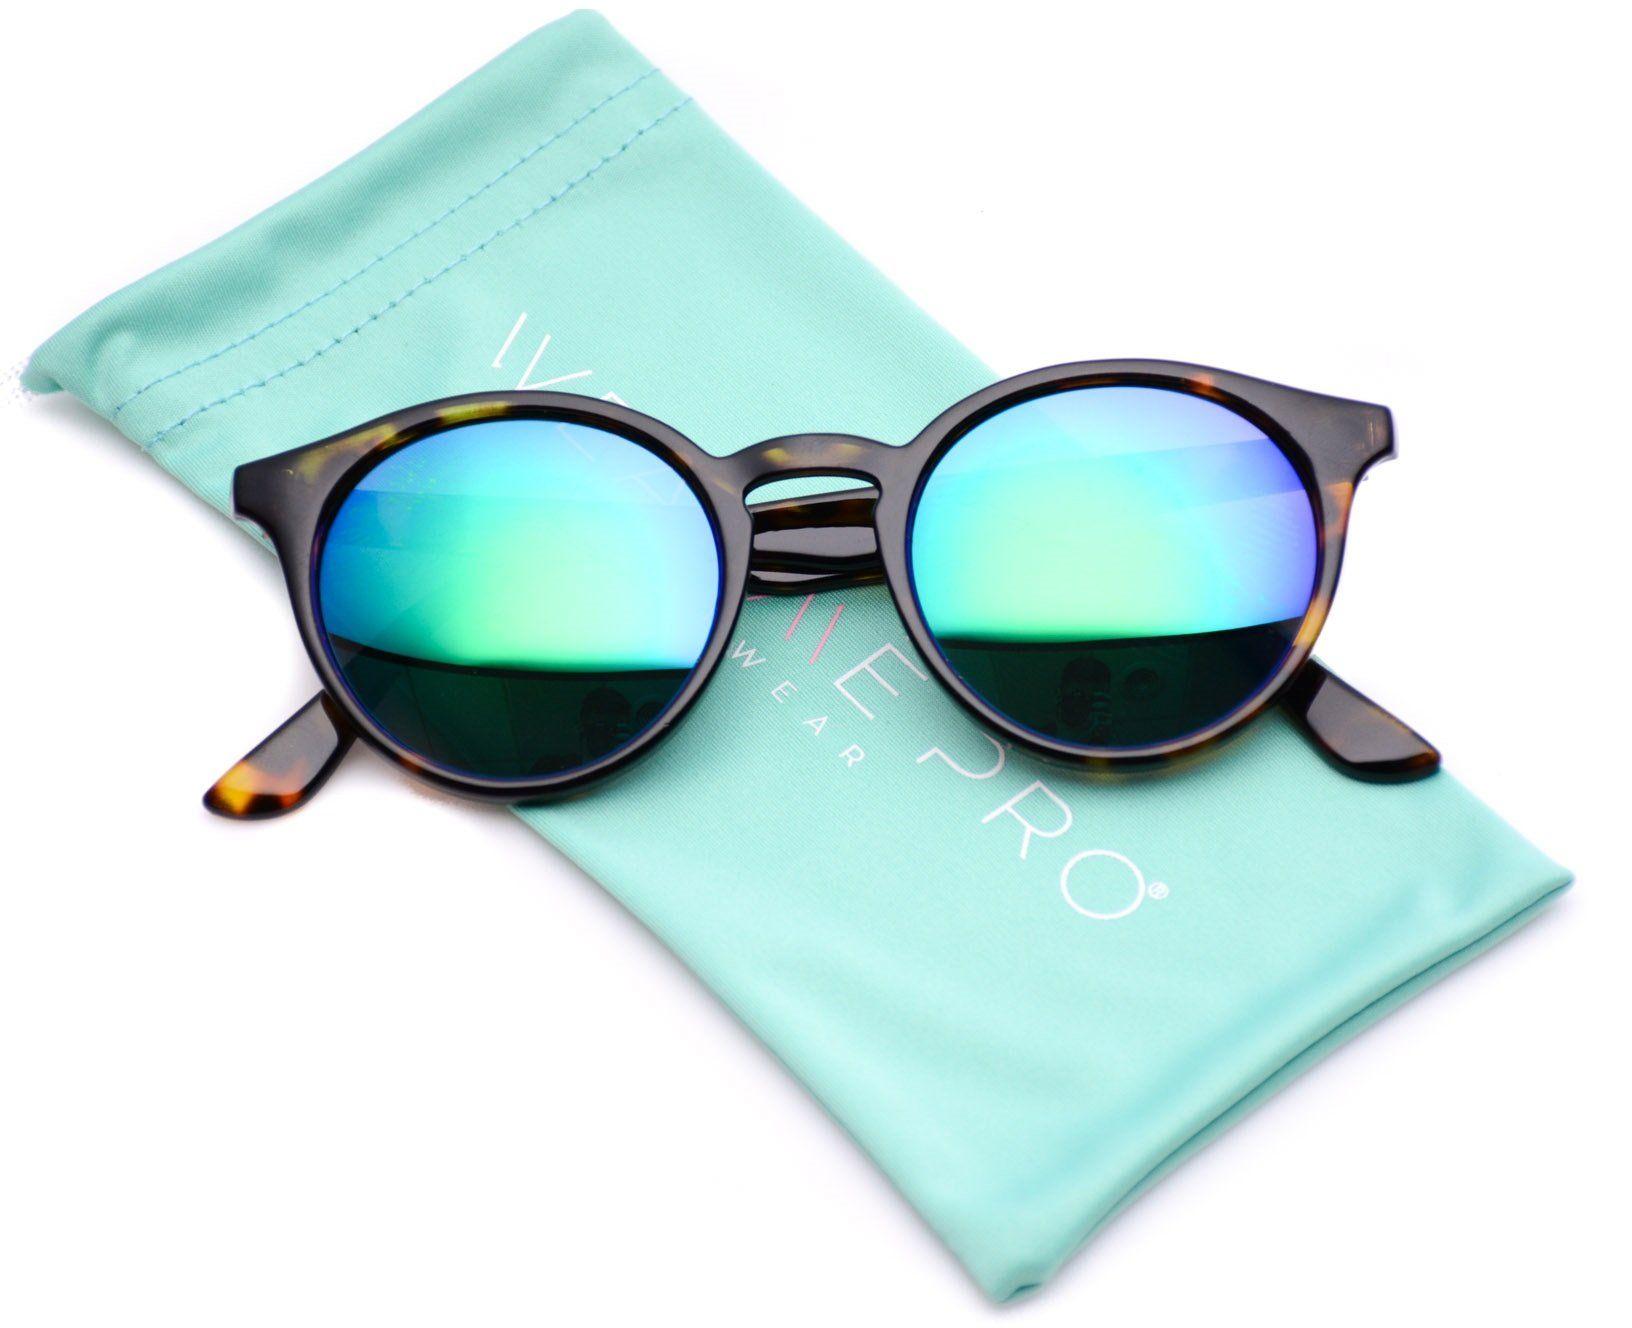 b57dc4e348 WearMe Pro Classic Small Round Retro Sunglasses Tortoise Frame  Mirror  Green Lens    Check